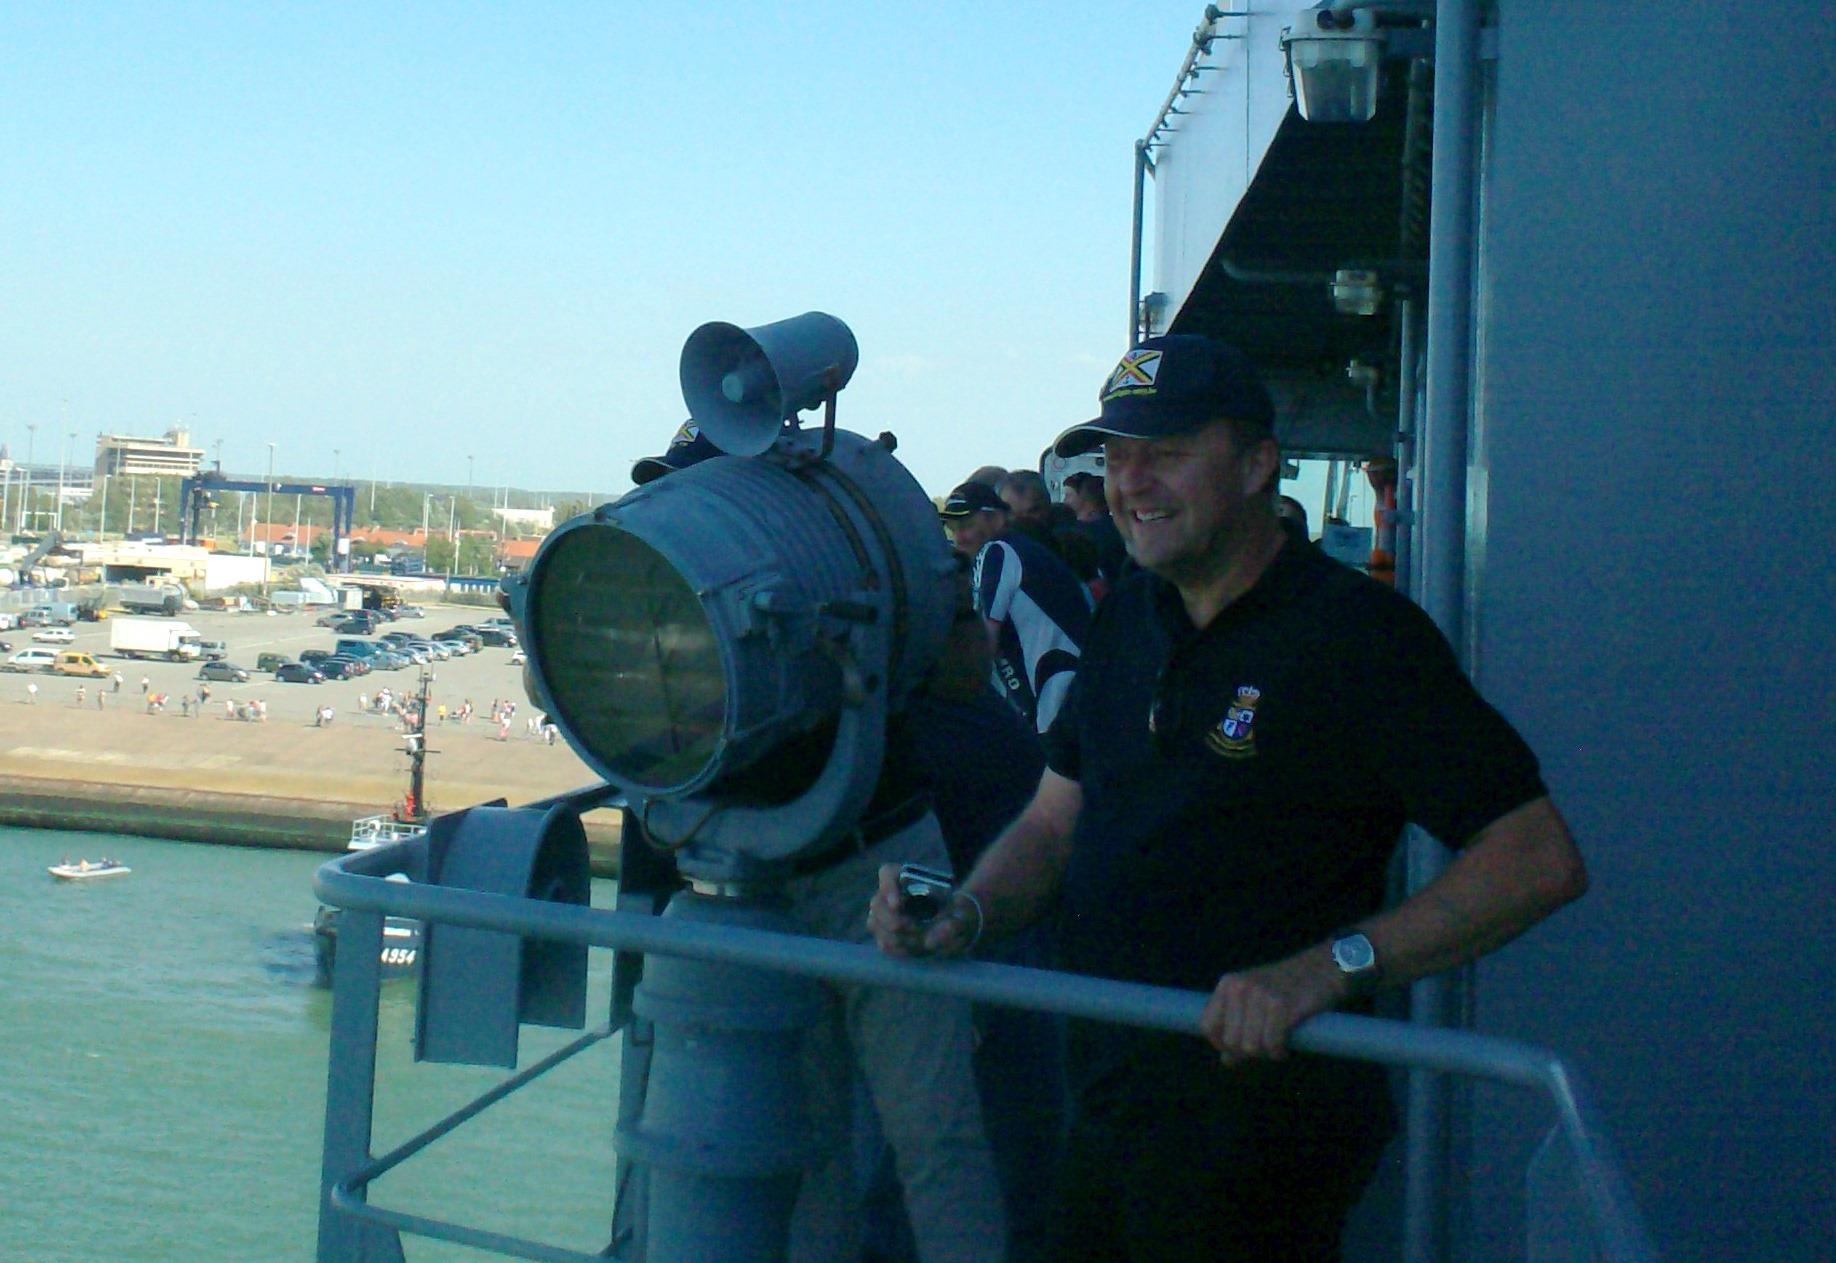 Vos photos du Navy Day 03&04/07/2010  - Page 2 547762HPIM1473